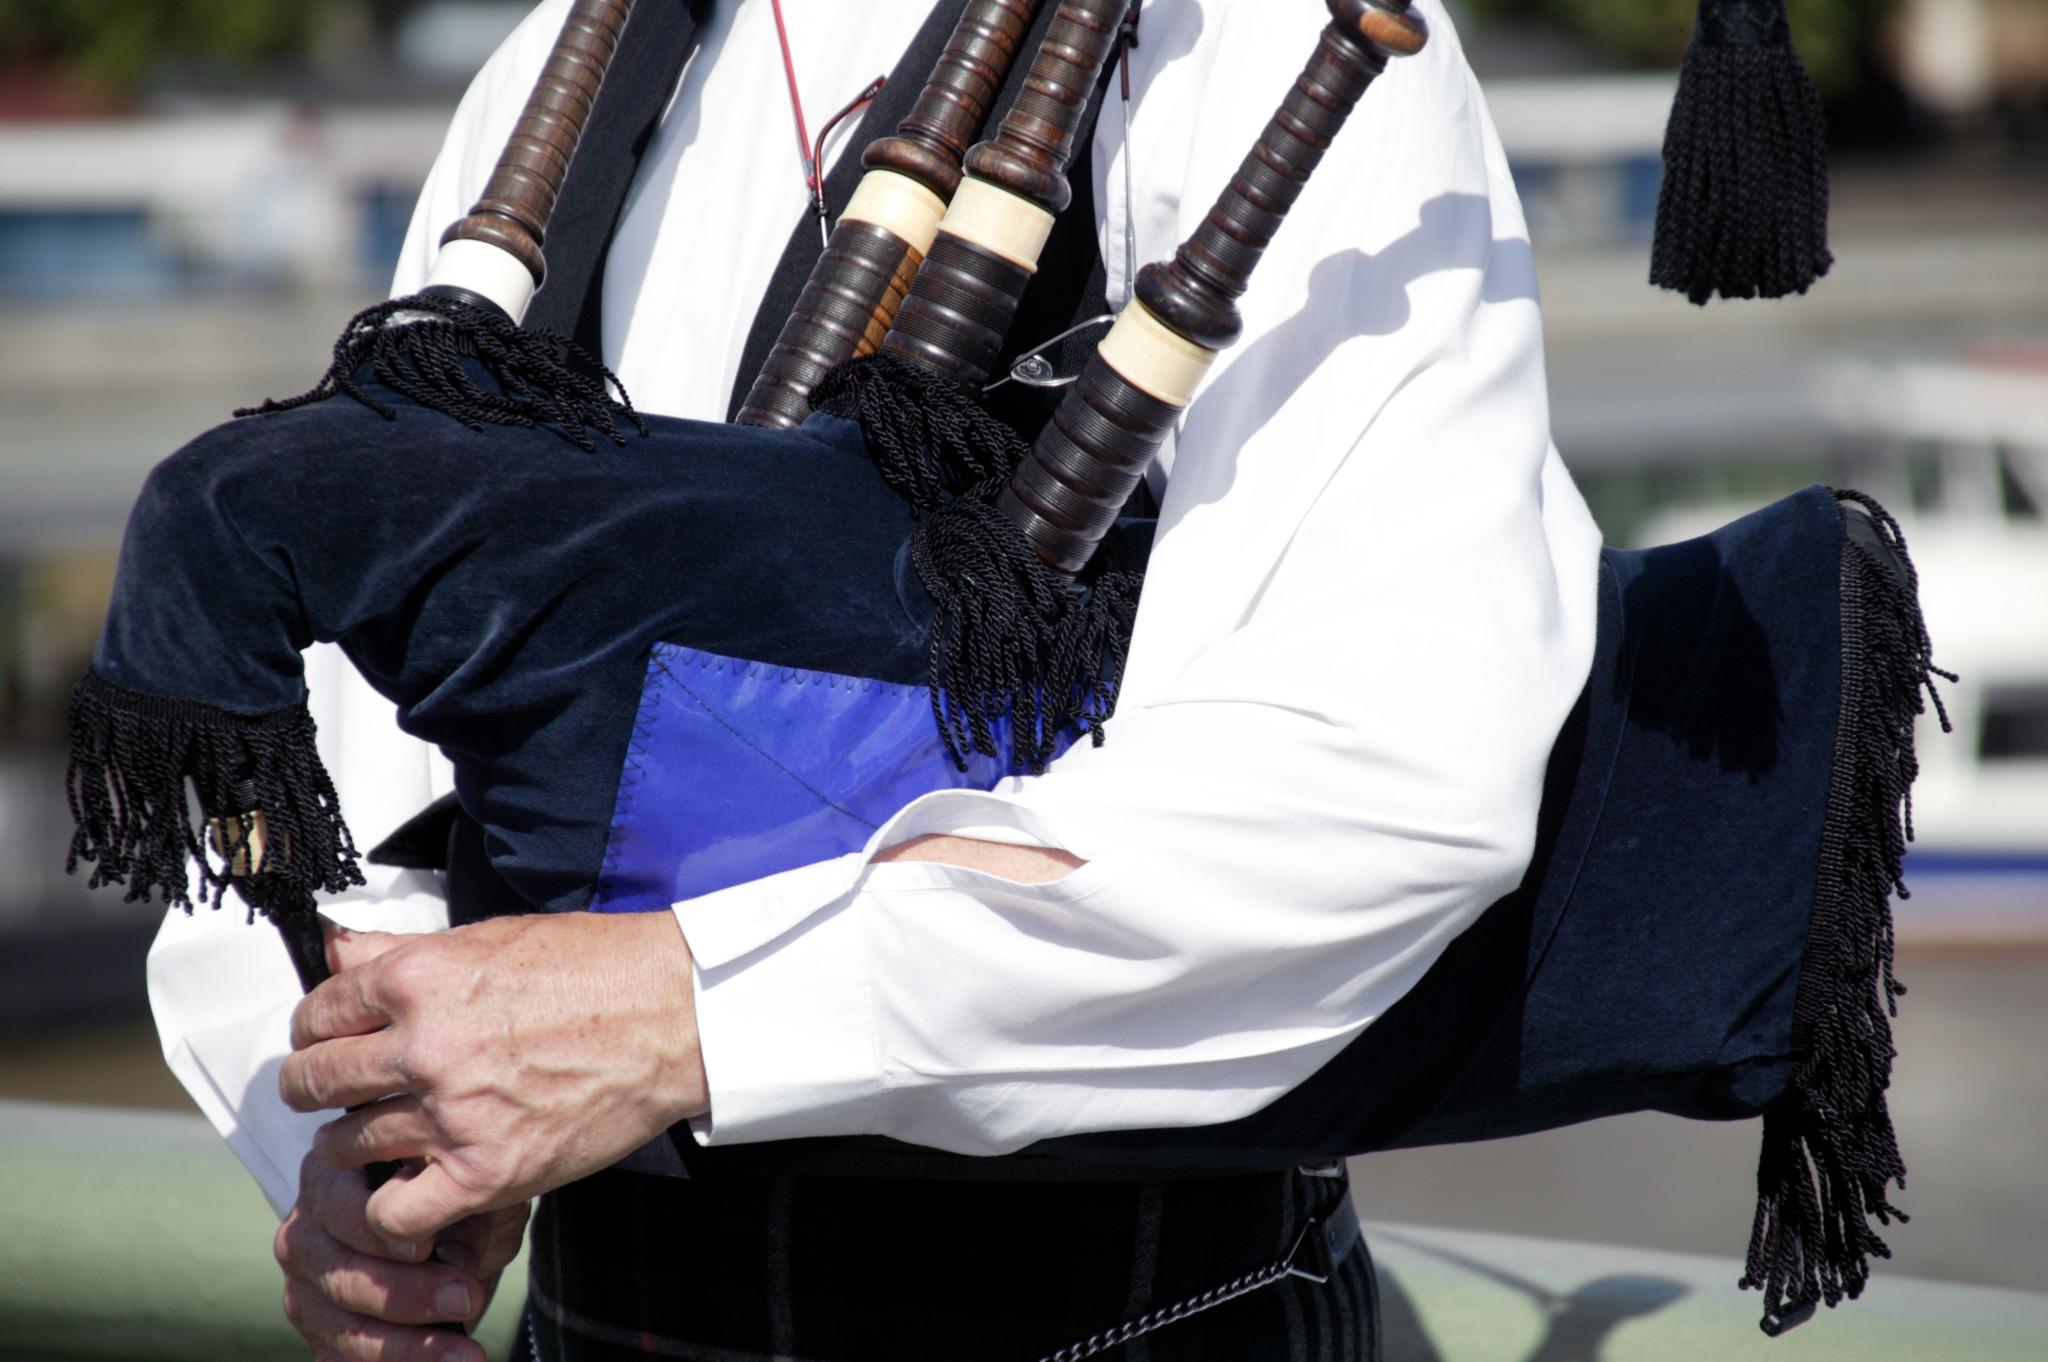 Piper playing traditional Scottish / Irish bagpipes